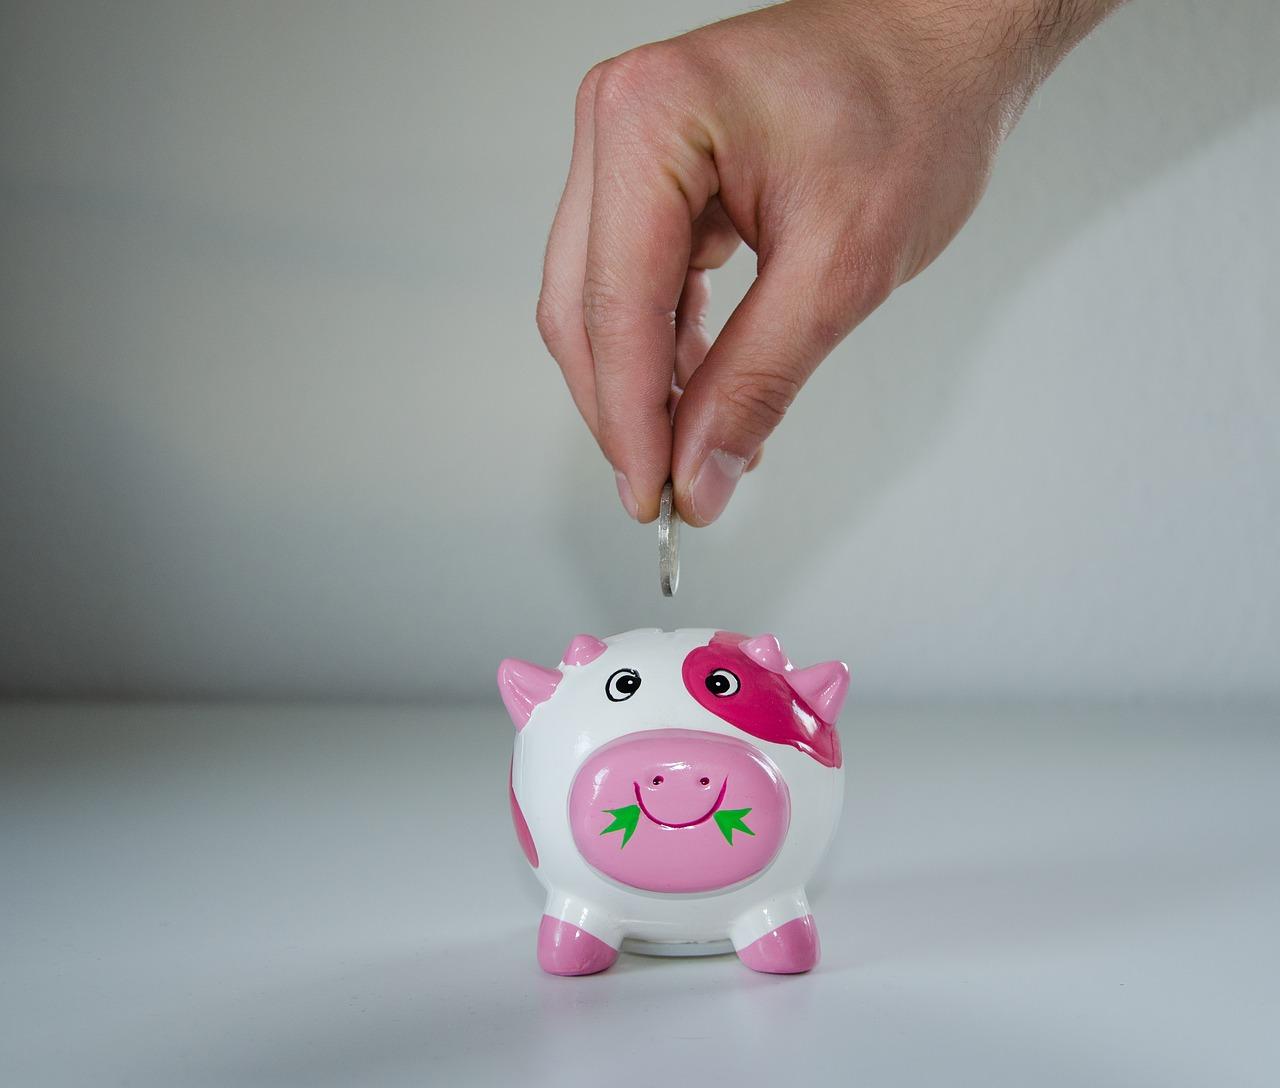 Saving in a Piggy Bank